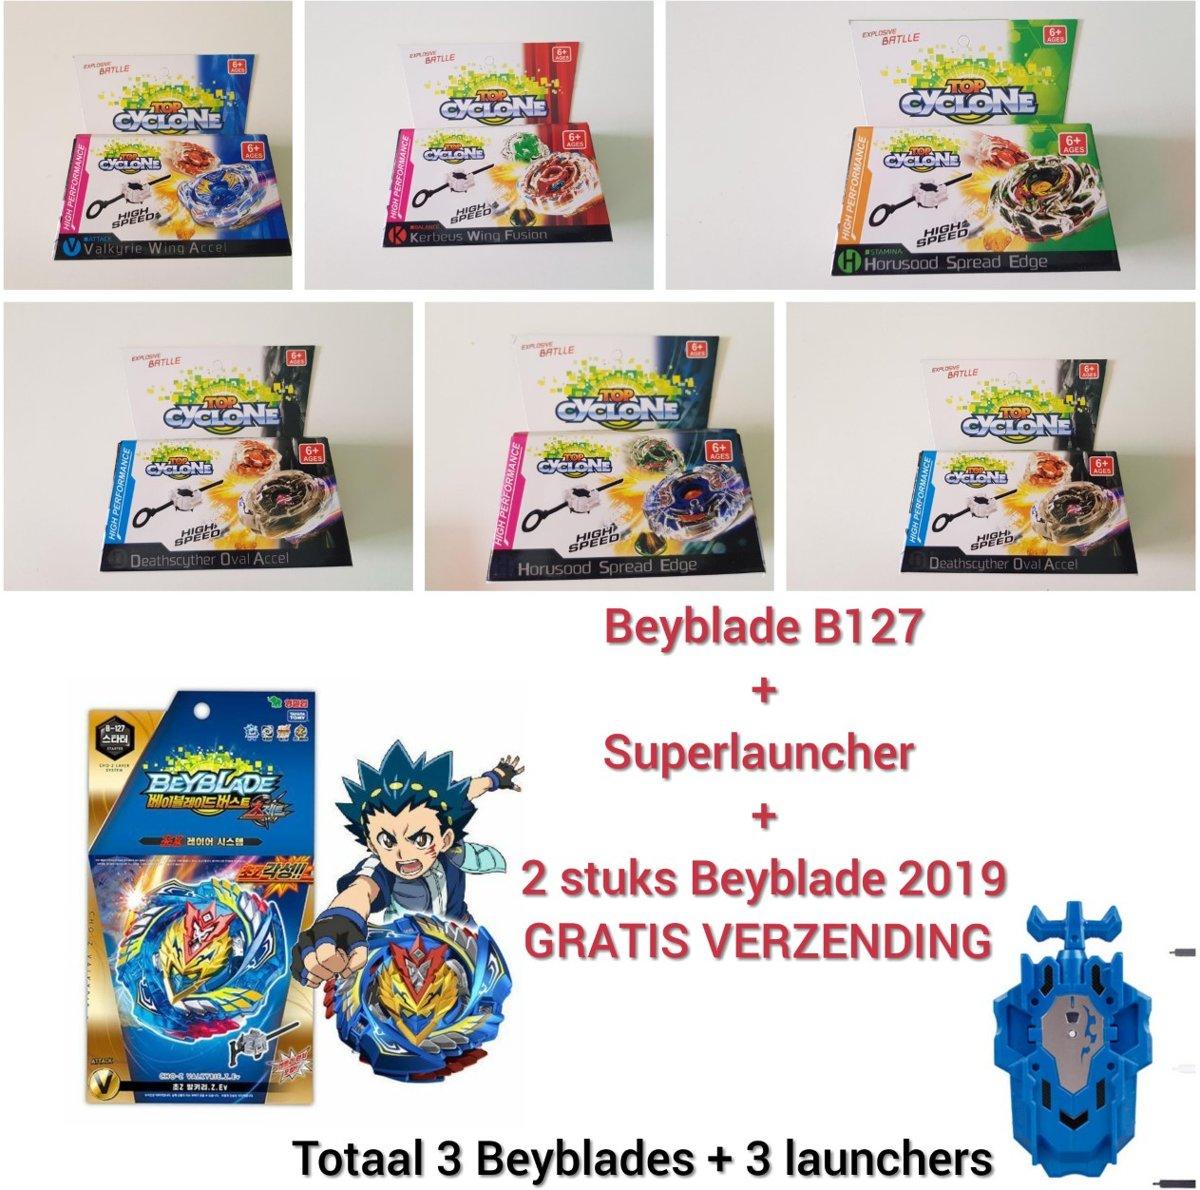 Beyblade SUPER PAKKET Evolution Choz-Z Valkyrie.Z met turbo launcher en 2 TOP CYCLONE BEYBLADES( GRATIS VERZENDING)